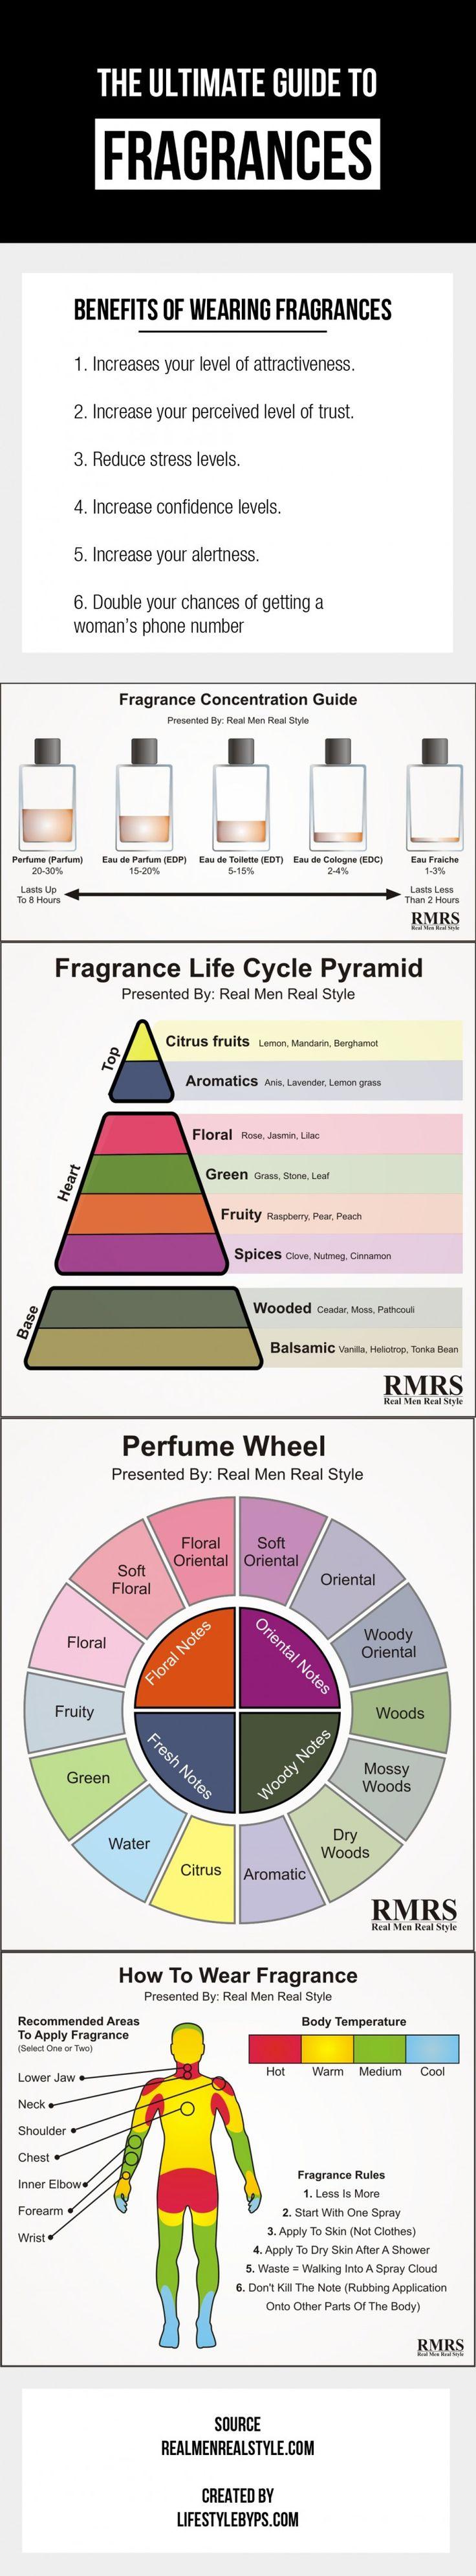 mywebroom blog lifestylebyps male fashion fragrance style infographic